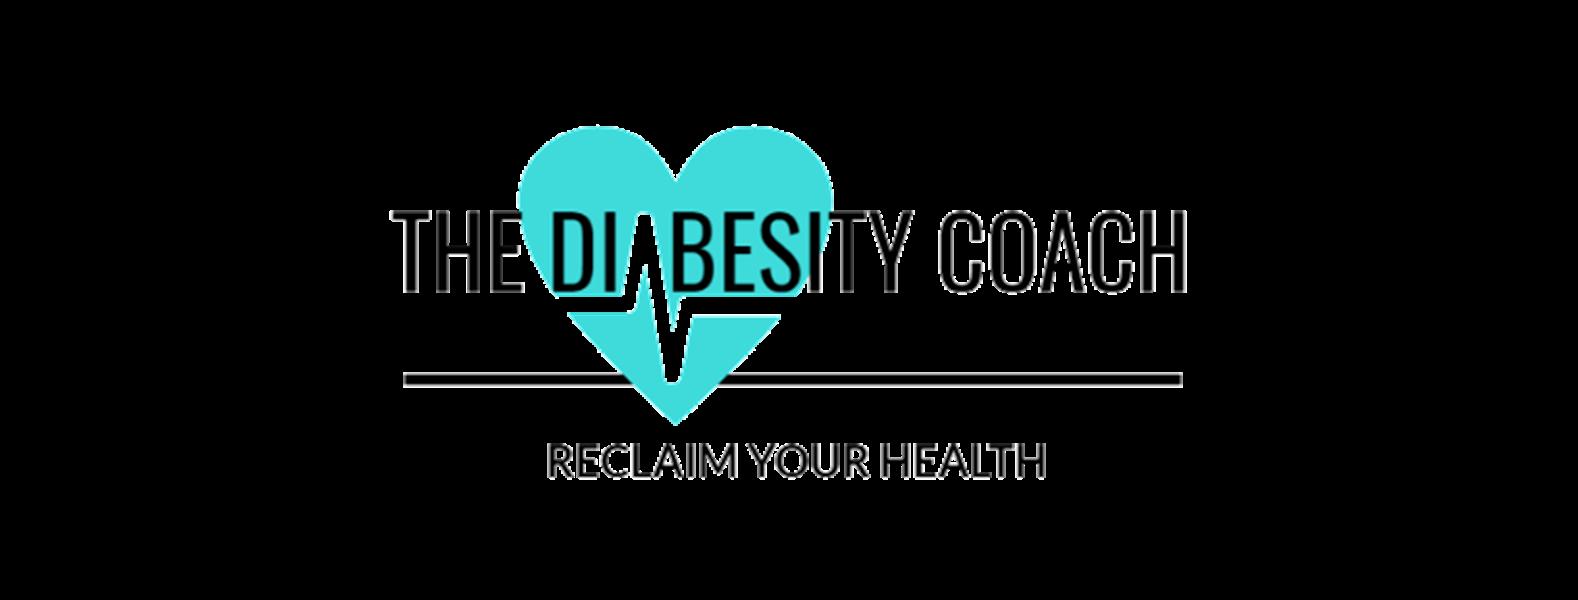 The Diabesity Coach, LLC